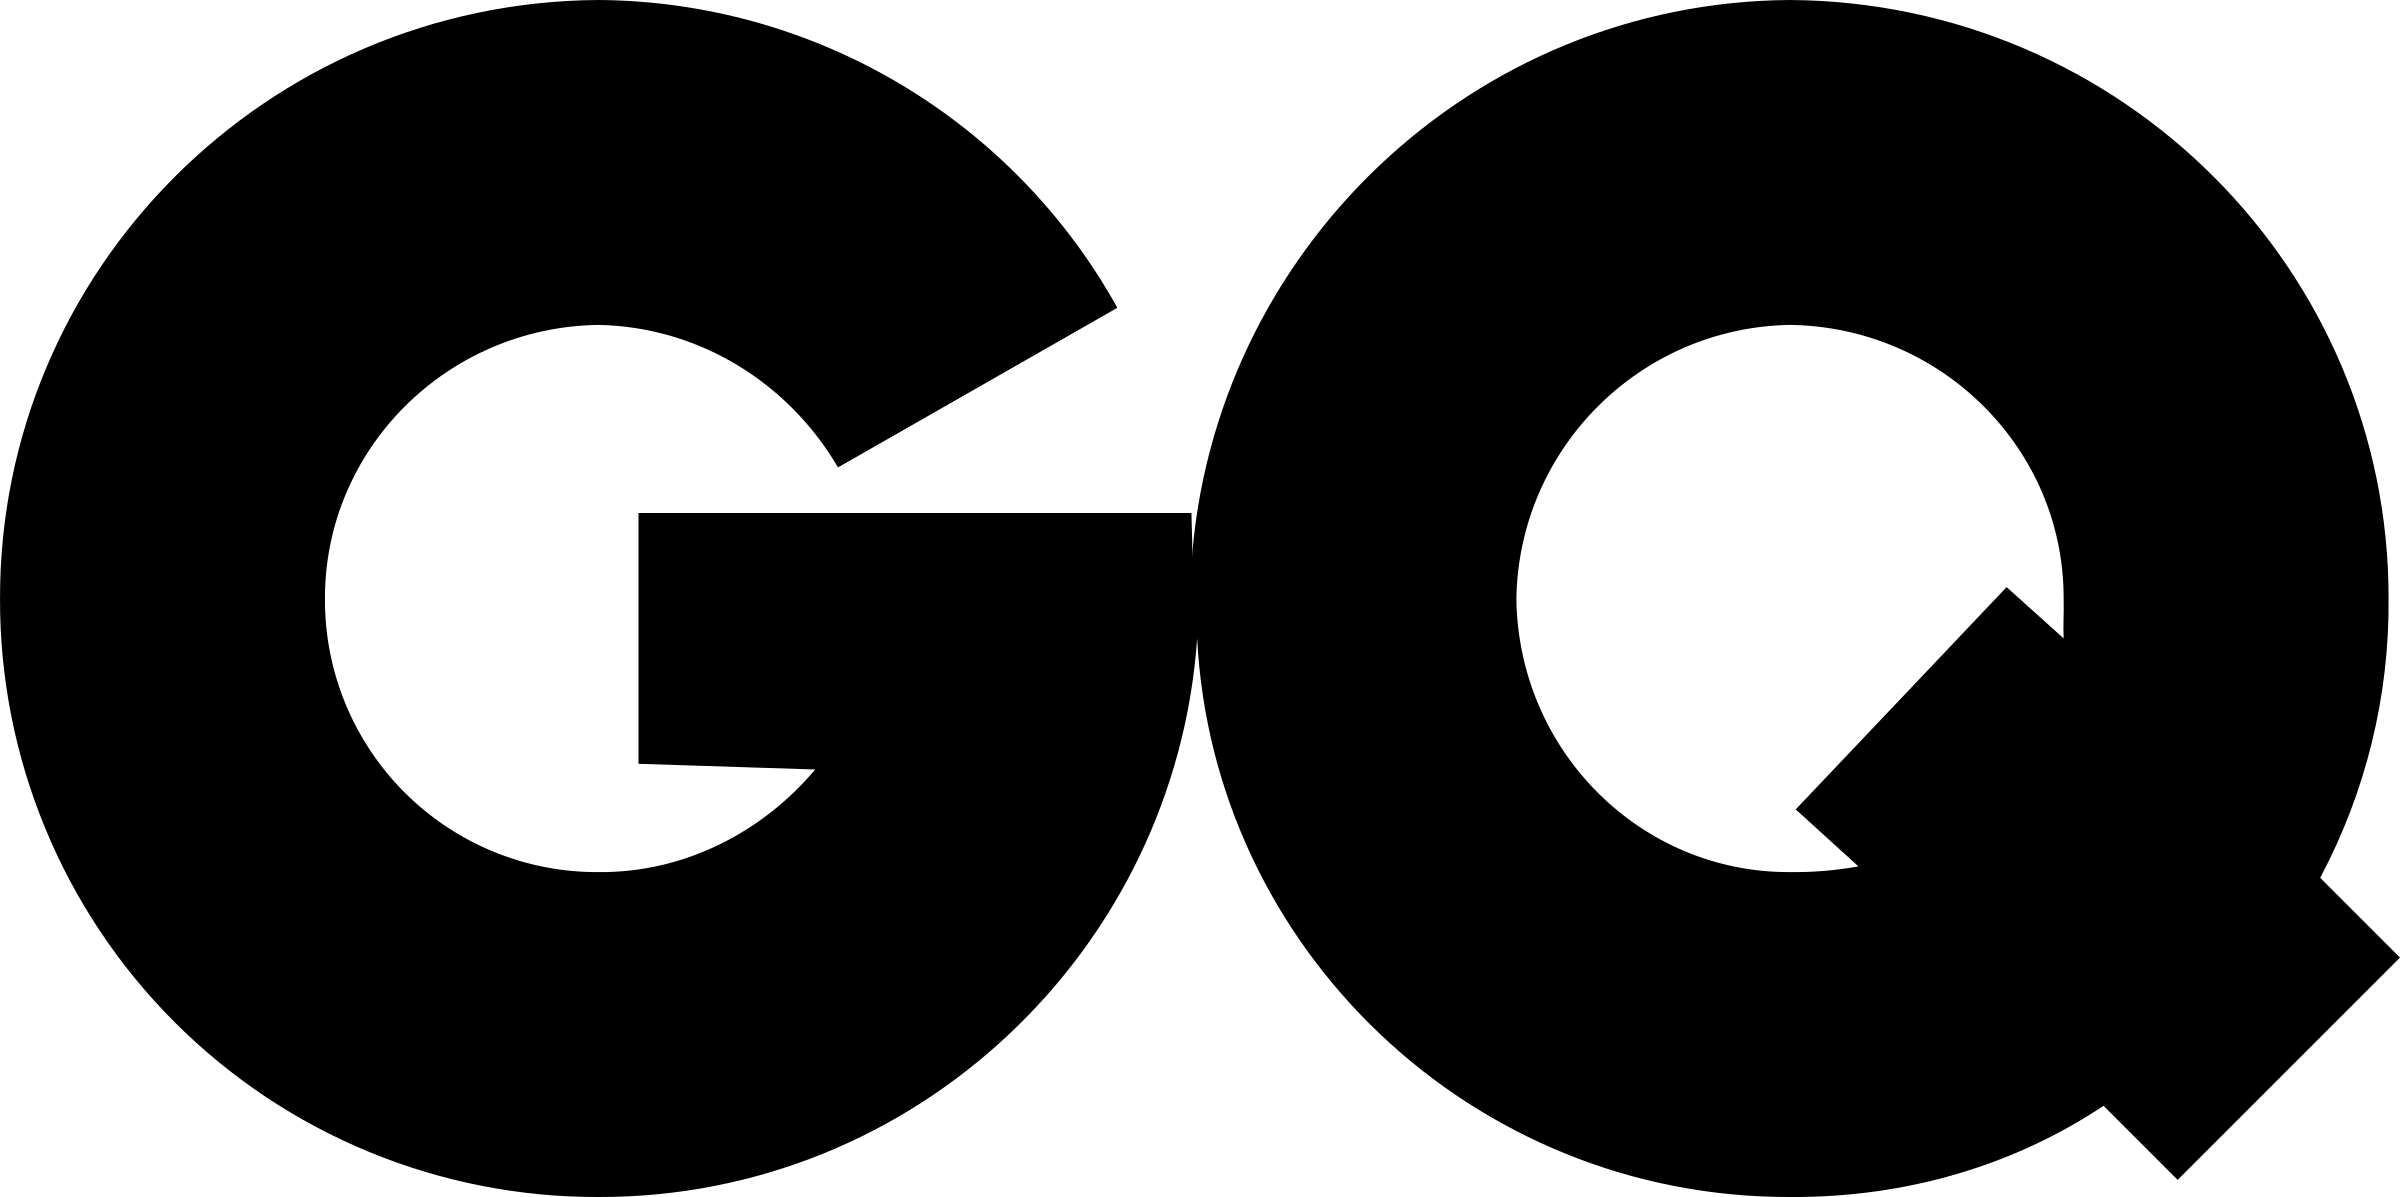 gq-logo-png-transparent.png